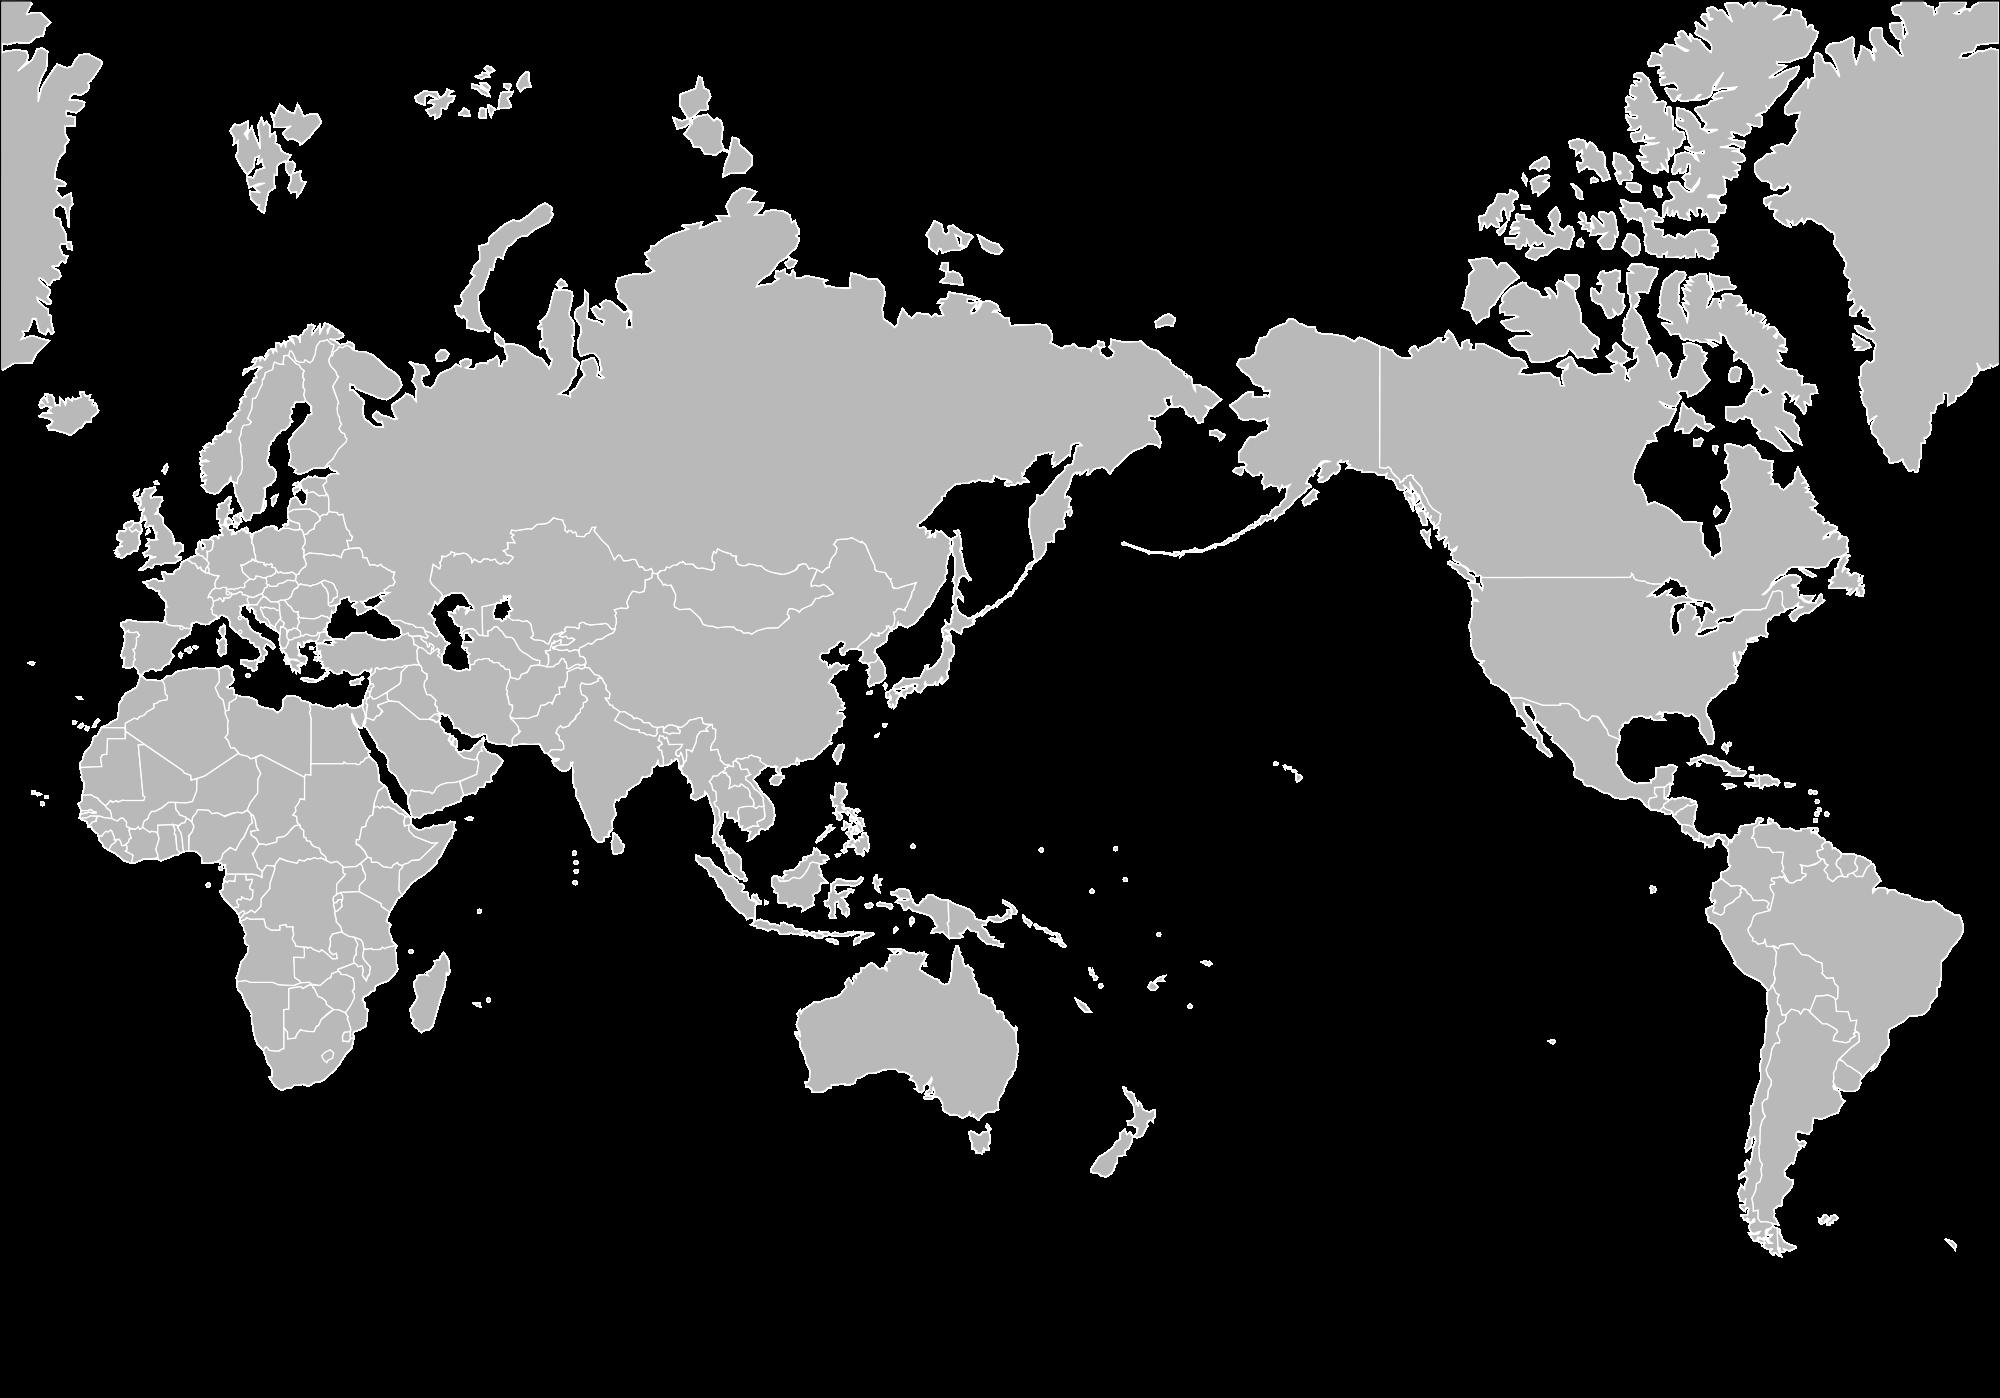 banner black and white stock atlas vector lifting world #109635806